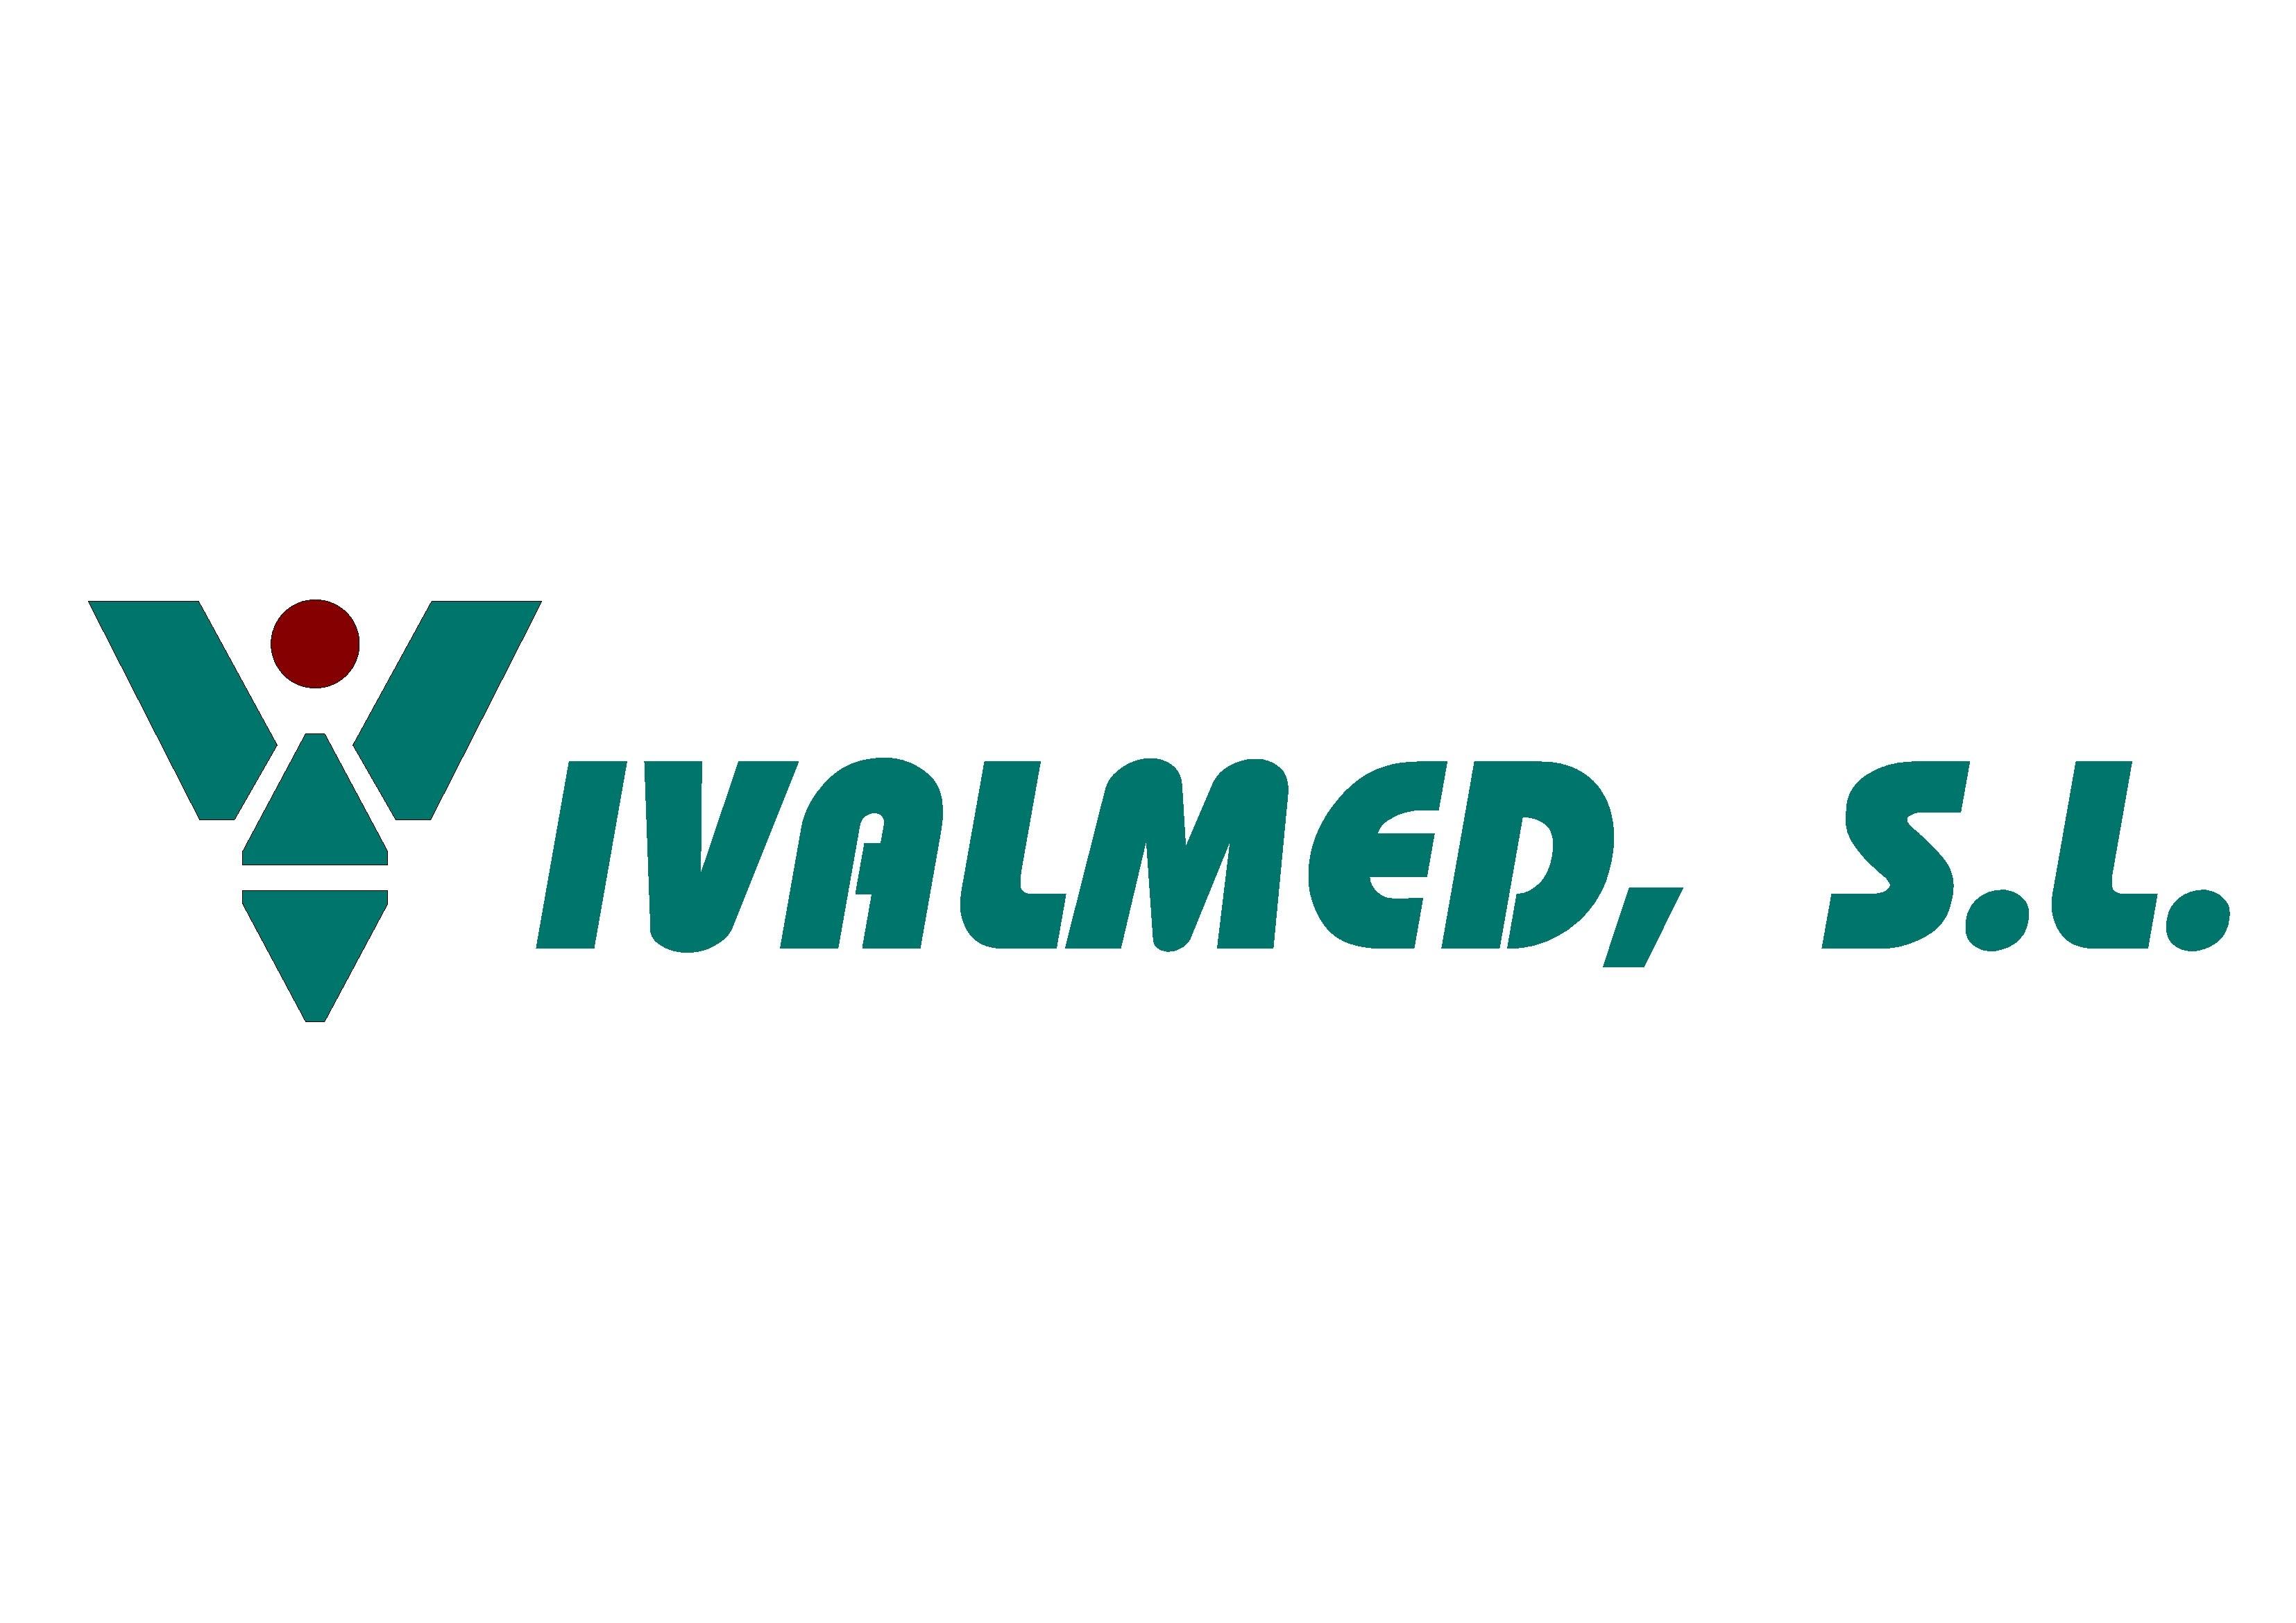 IVALMED logotipo